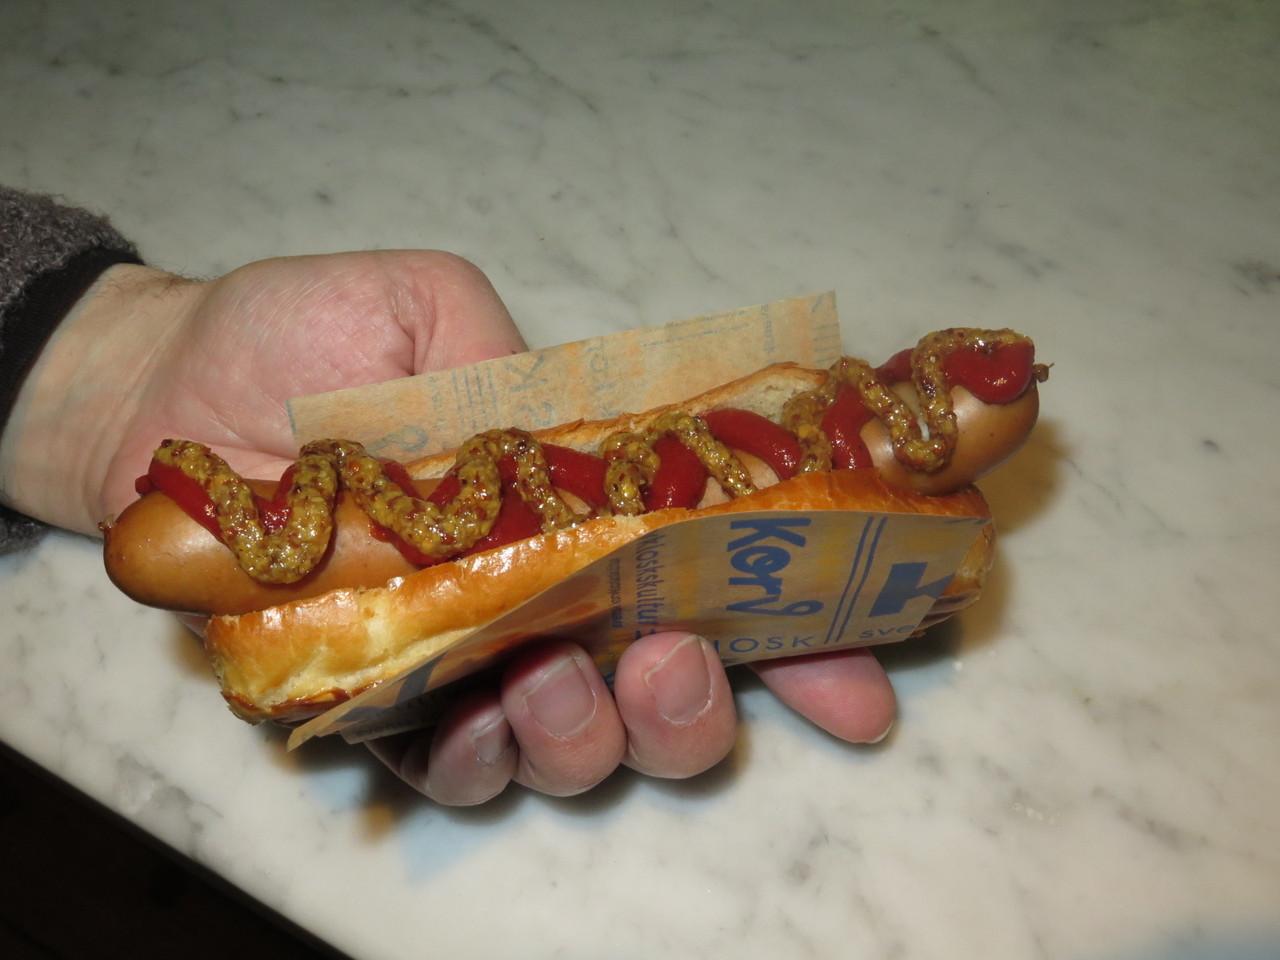 Kokt Wienerkorv do KORVKIOSK